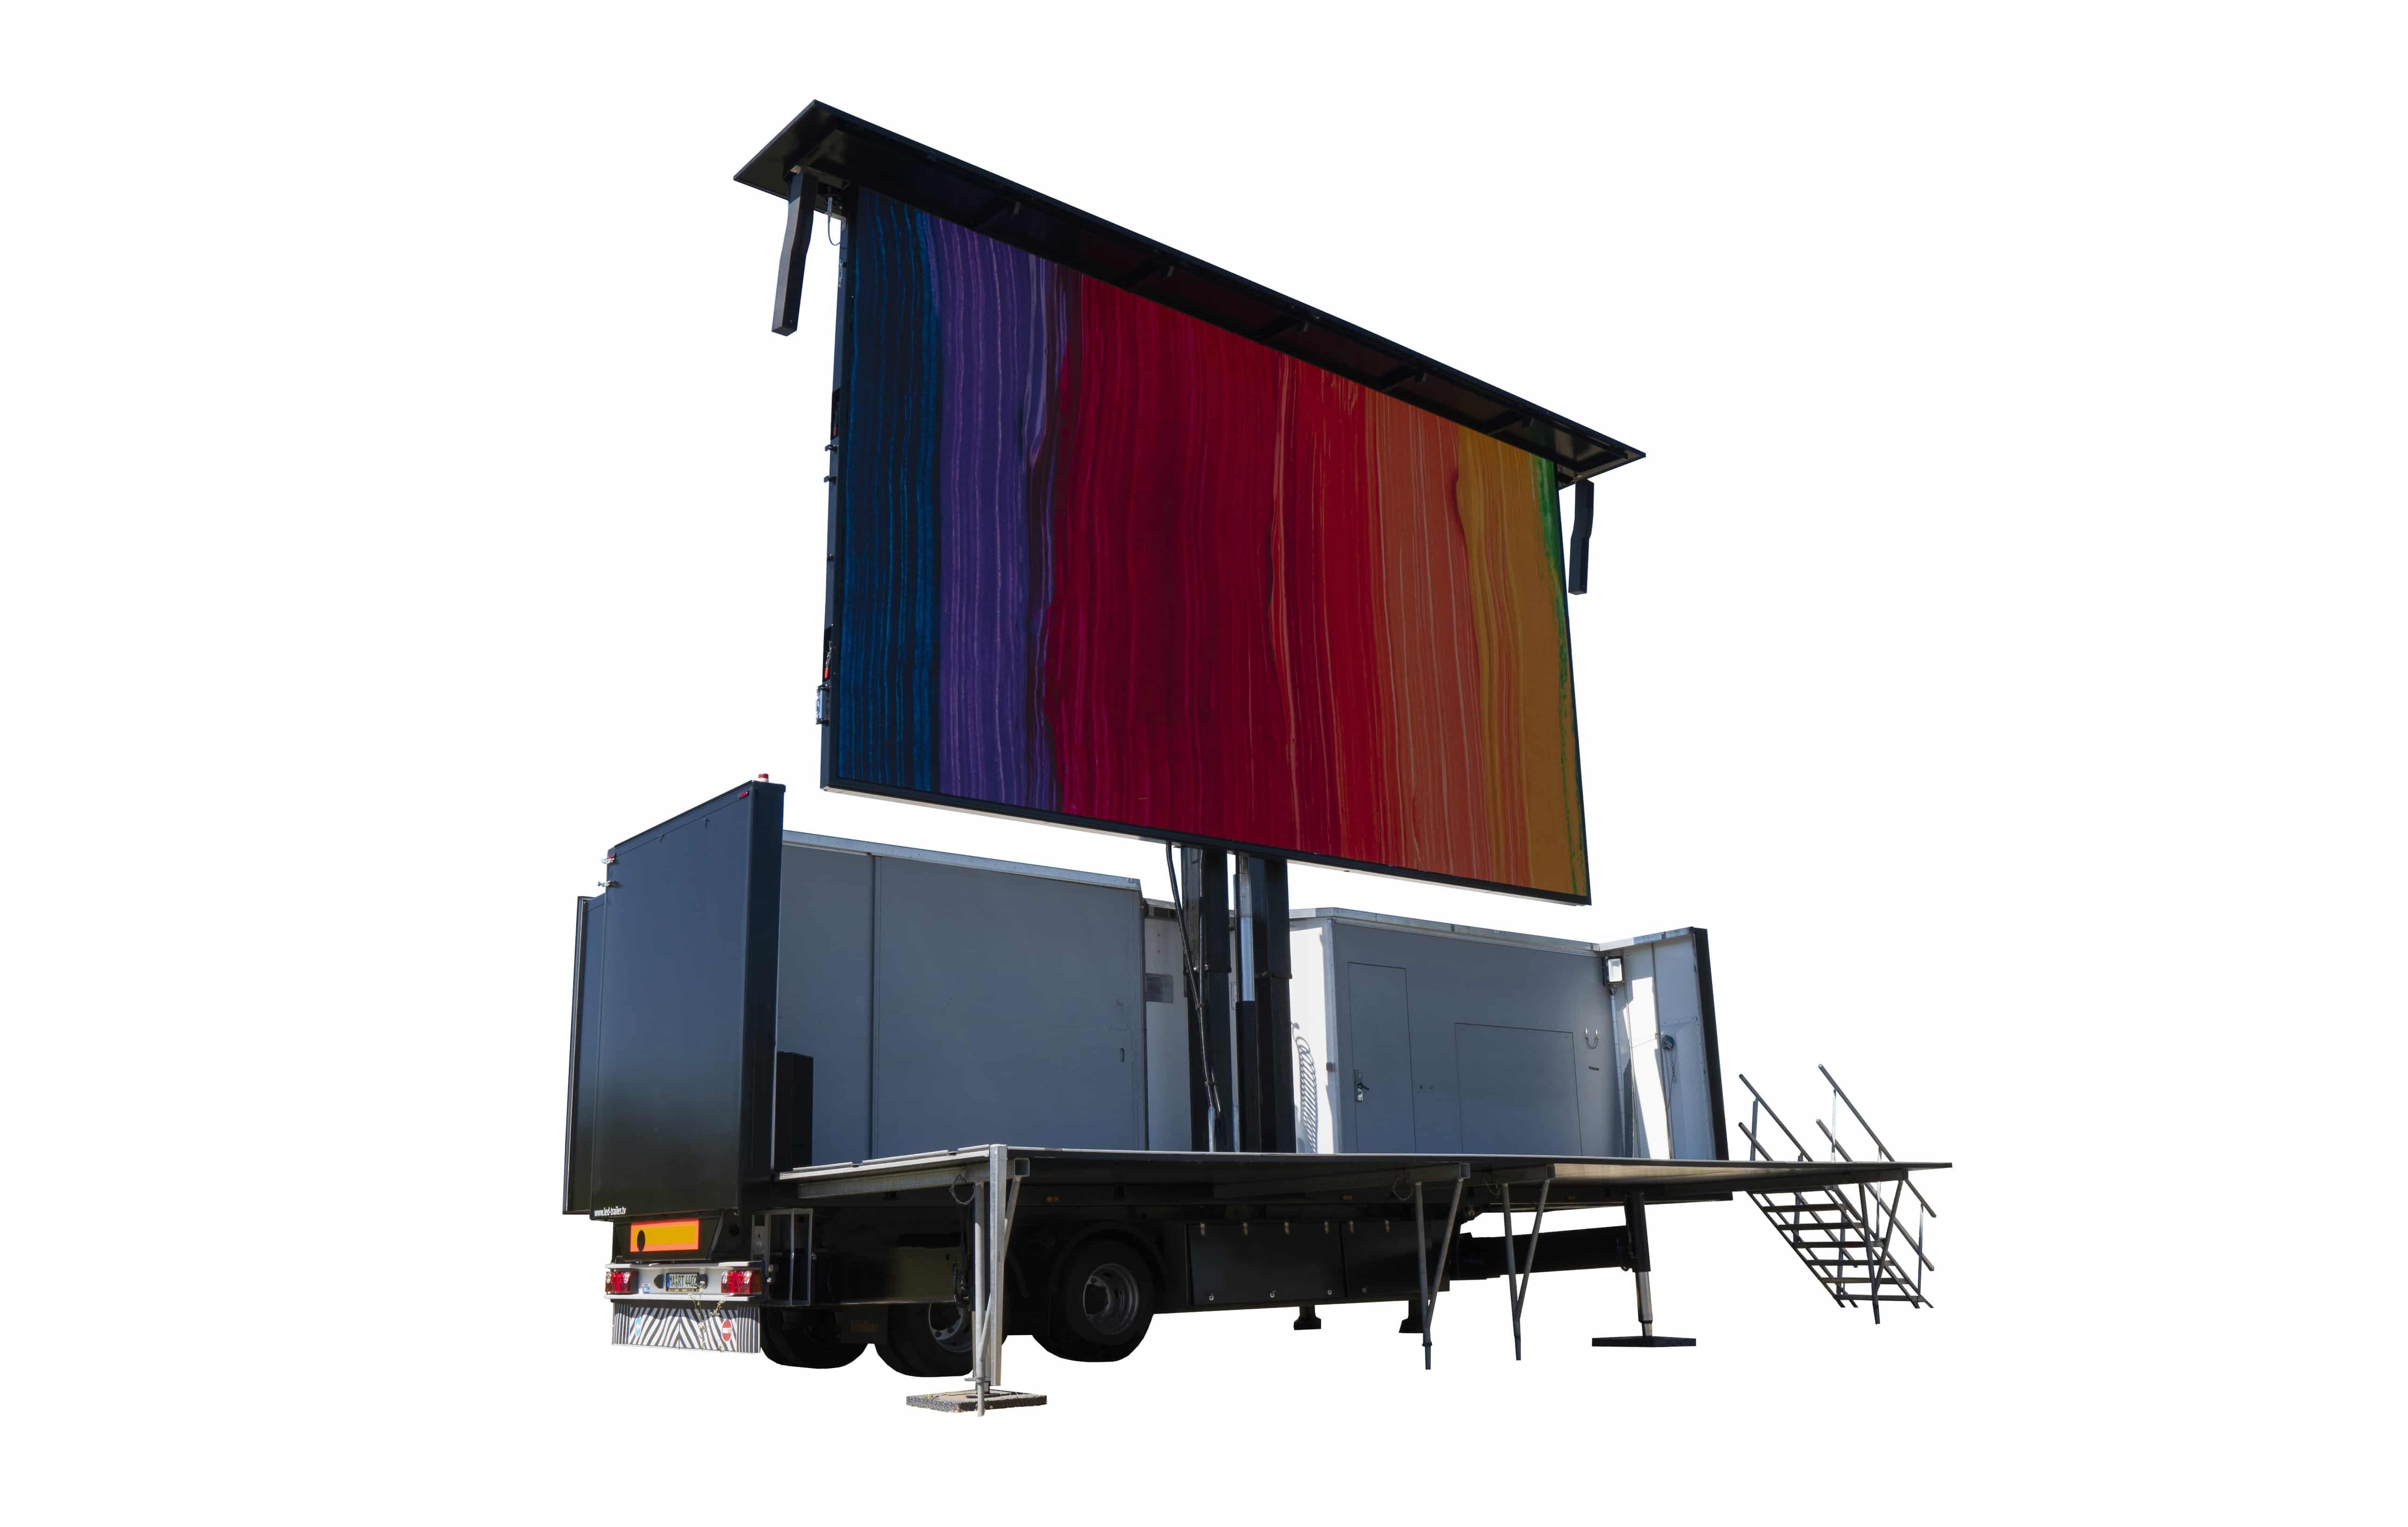 rB50 LED-Truck Side Freigestellt